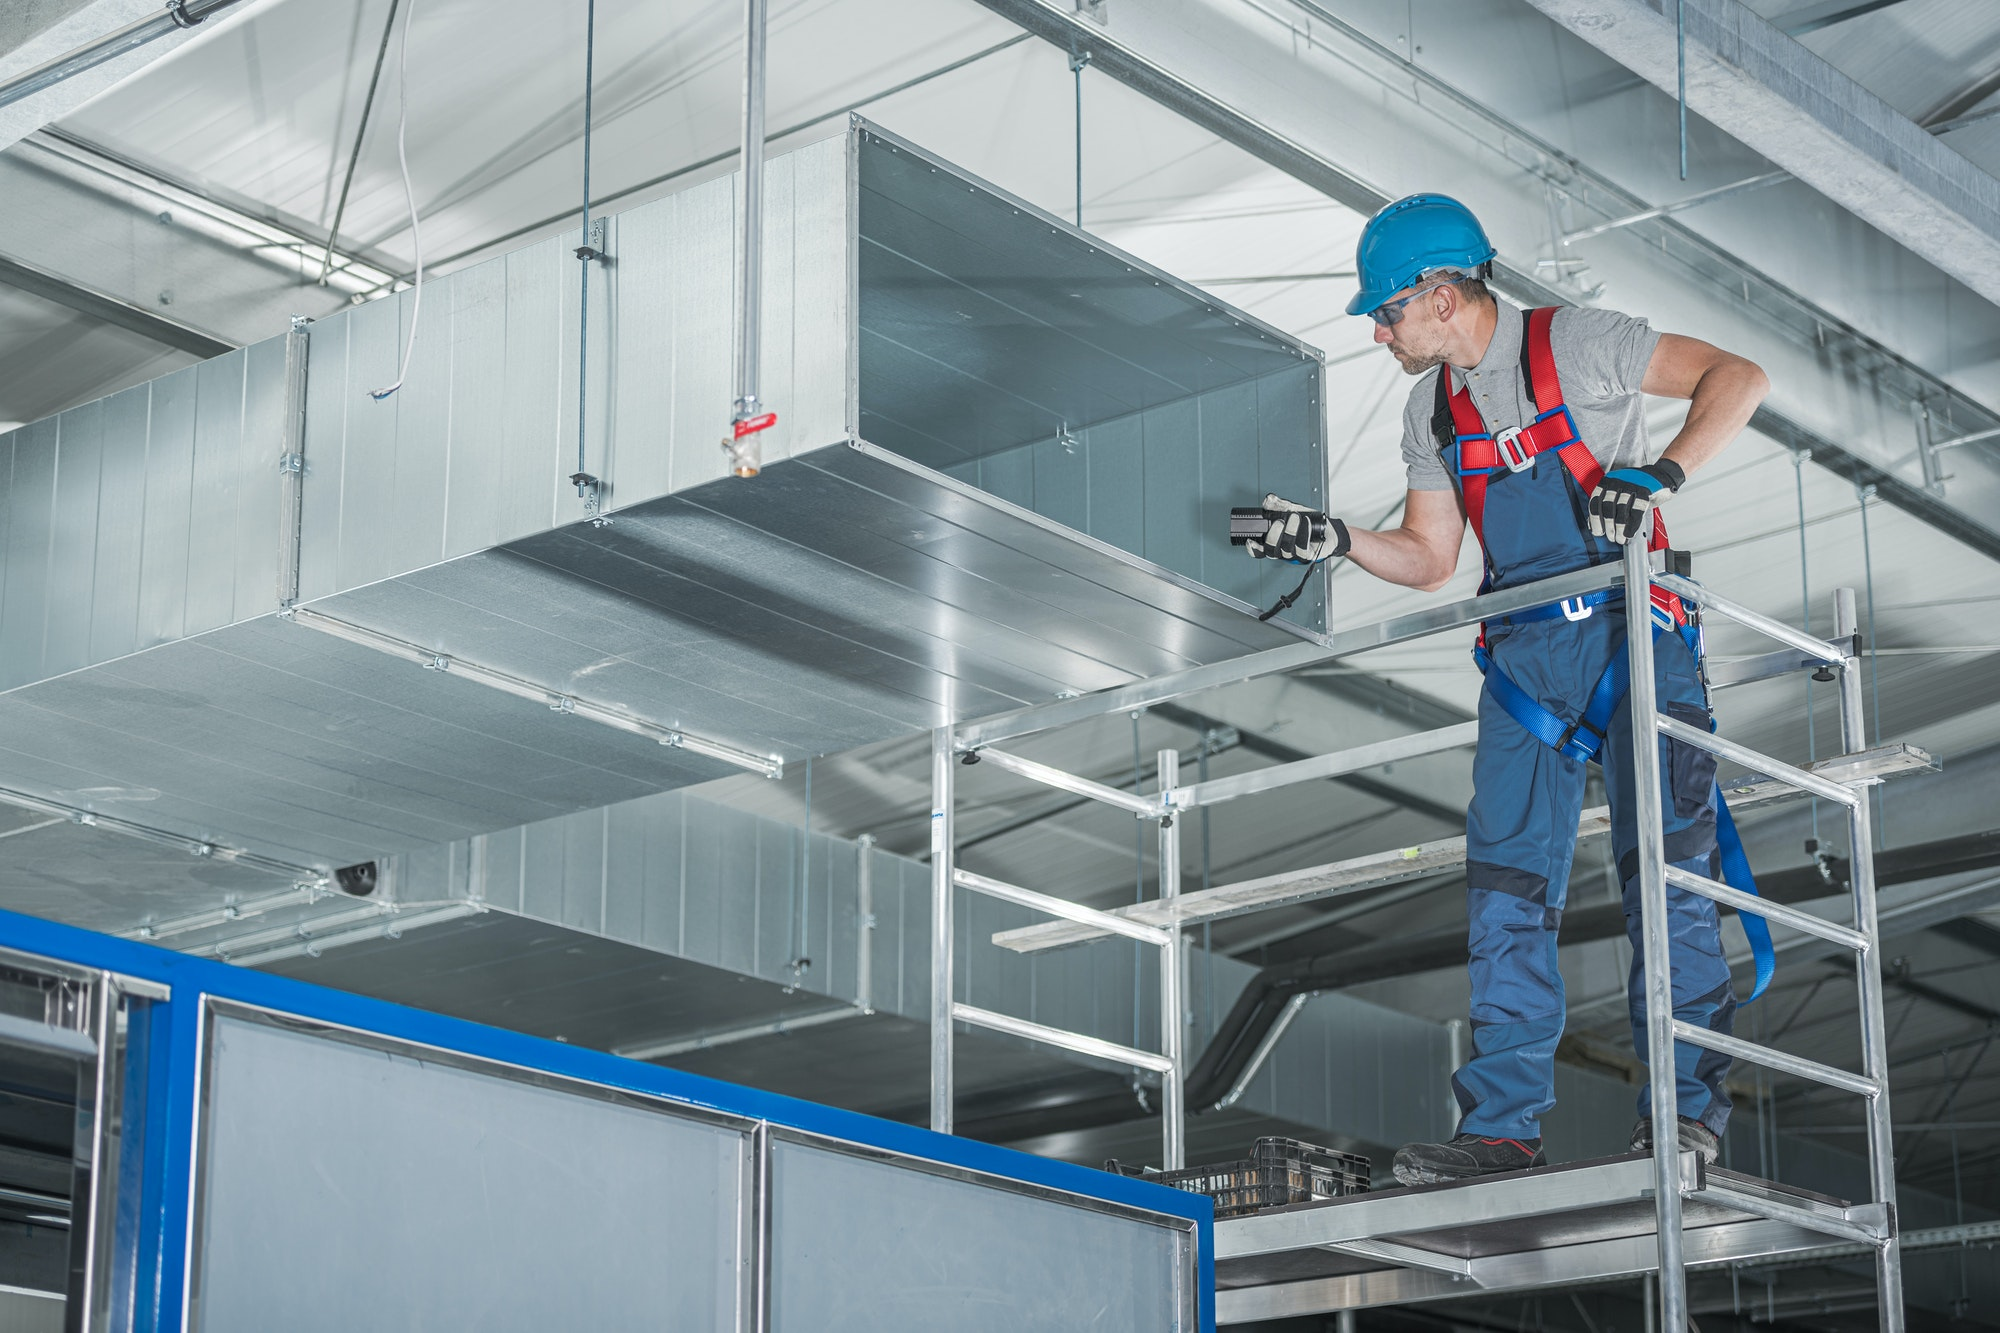 hvac-technician-testing-newly-installed-warehouse-ventilation-system